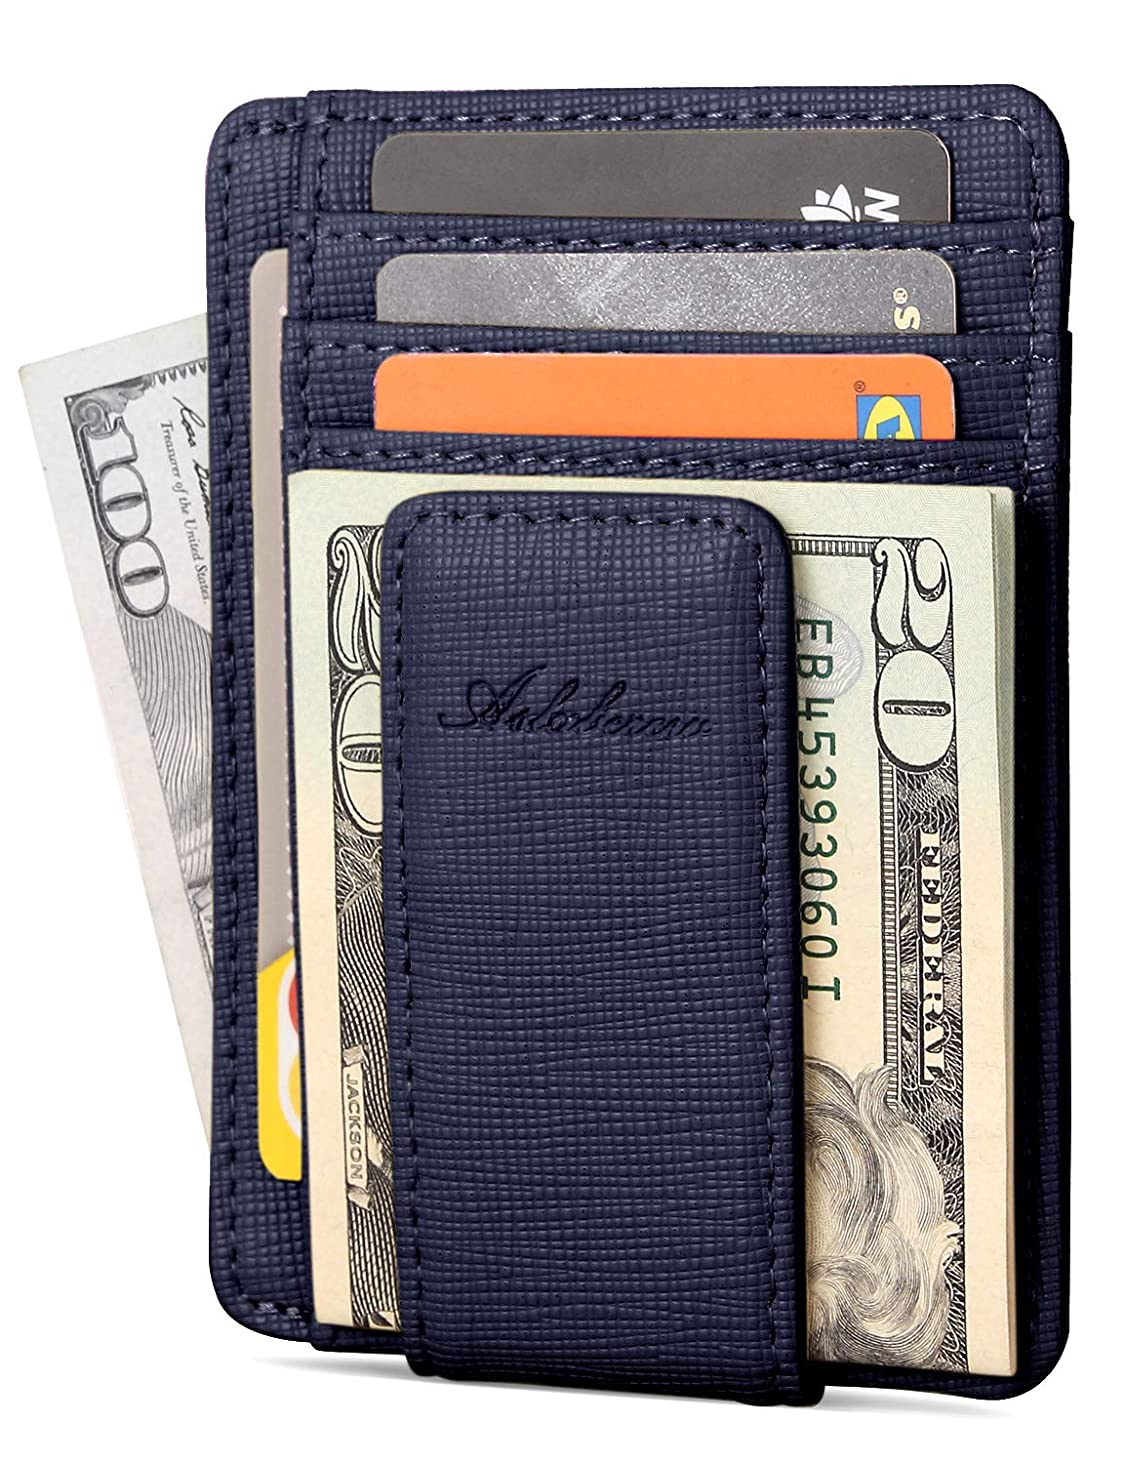 AslabCrew Minimalist Genuine Leather Magnetic Front Pocket Money Clip Wallet RFID Blocking Card Wallets